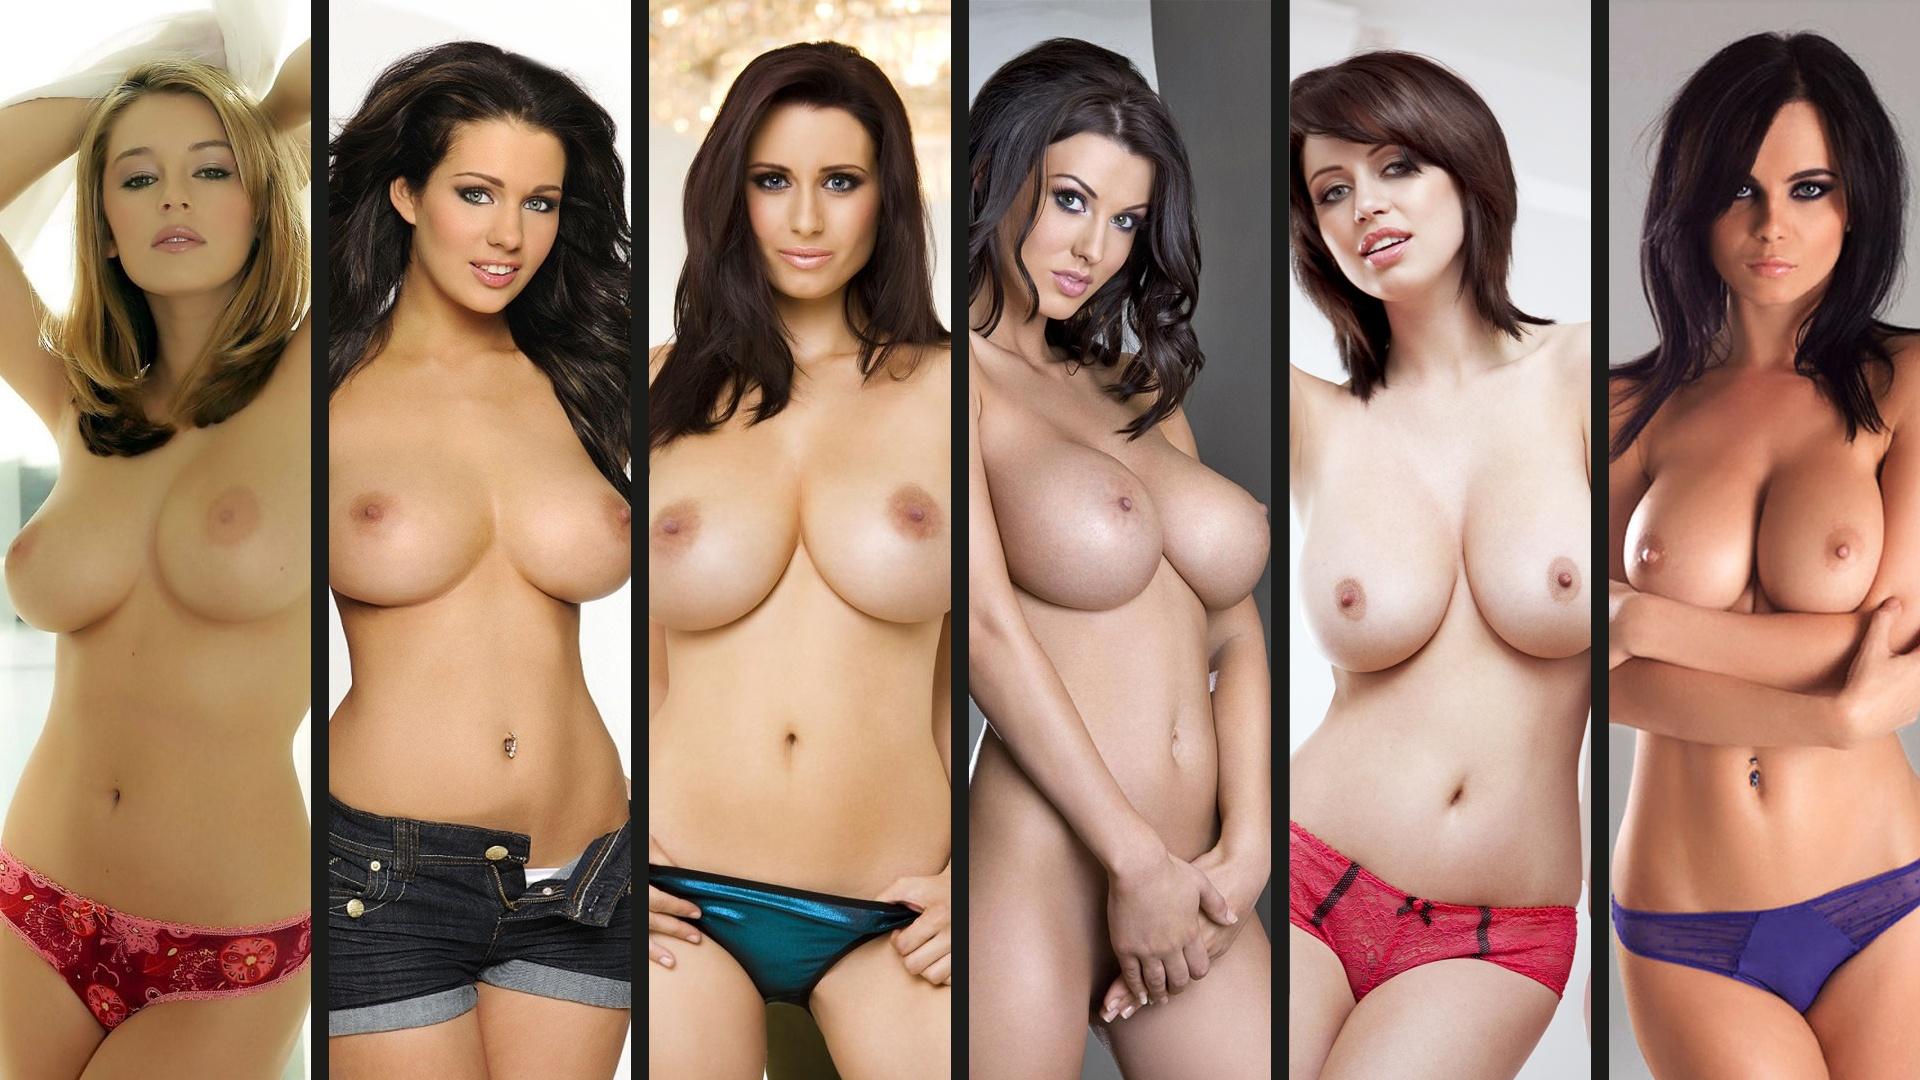 Gta 5 sexy modle nude hentai photo